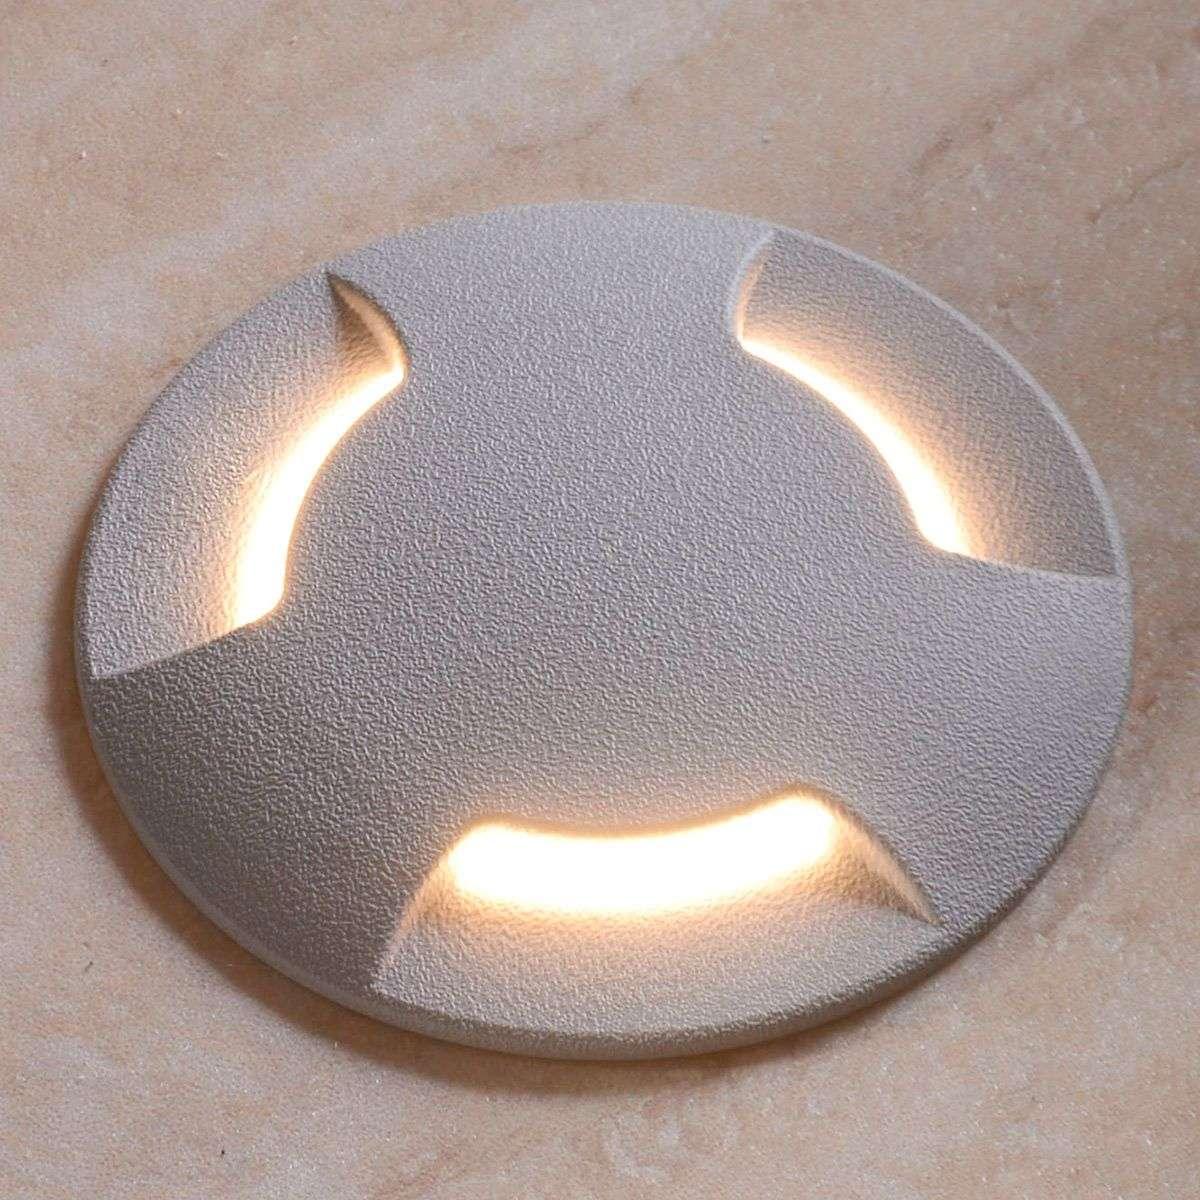 recessed floor lighting. Recessed Floor Light LED Ceci 120-3 L-3538037-31 Lighting I